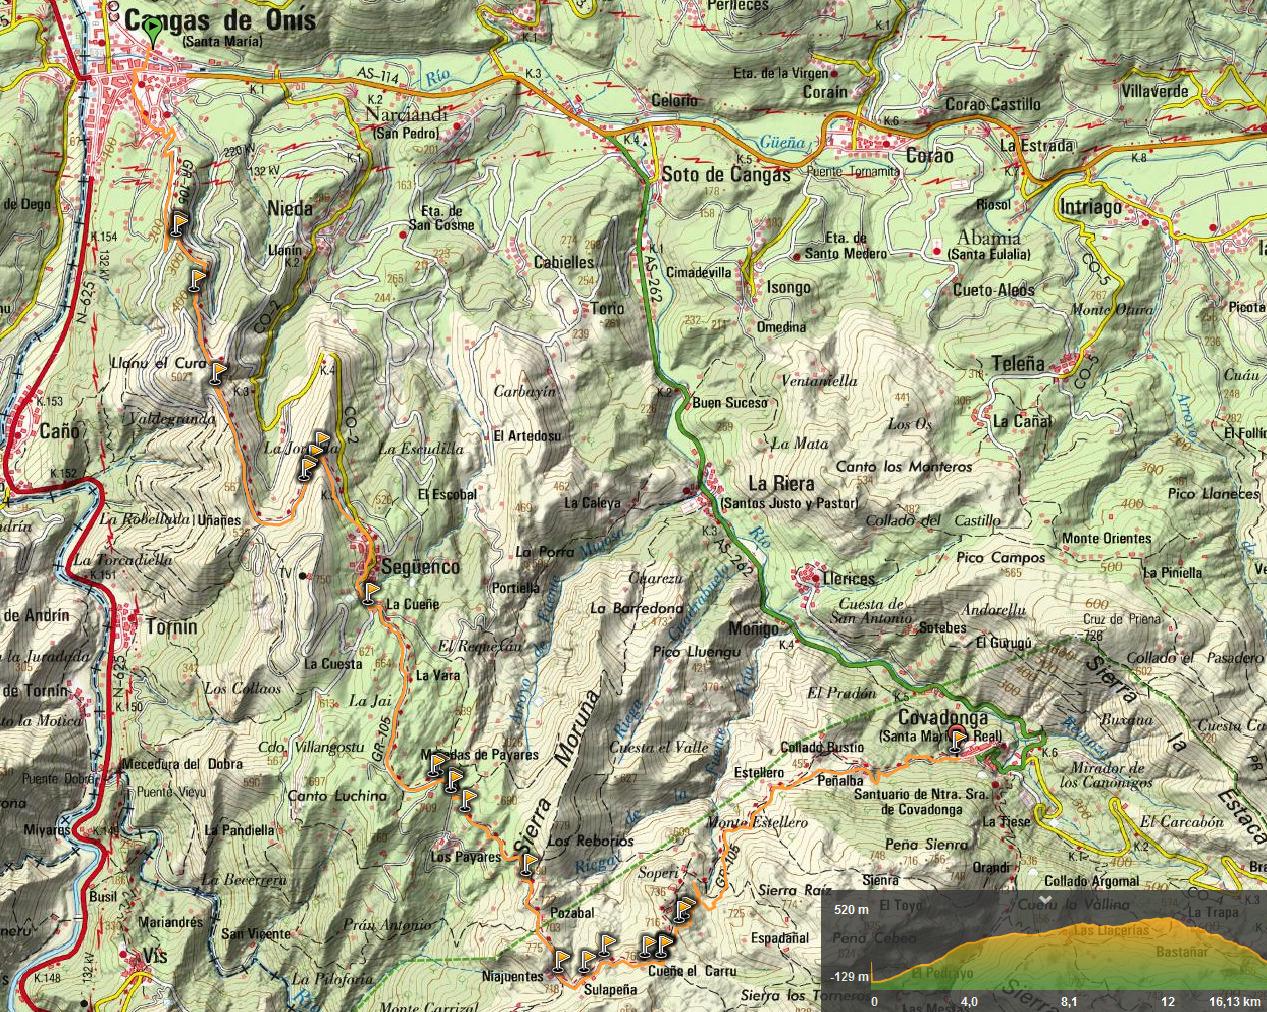 23 junio, 2019: Oviedo - Covadonga 7ª etapa (Cangas de Onís - Covadonga) (Wikiloc / IGN)